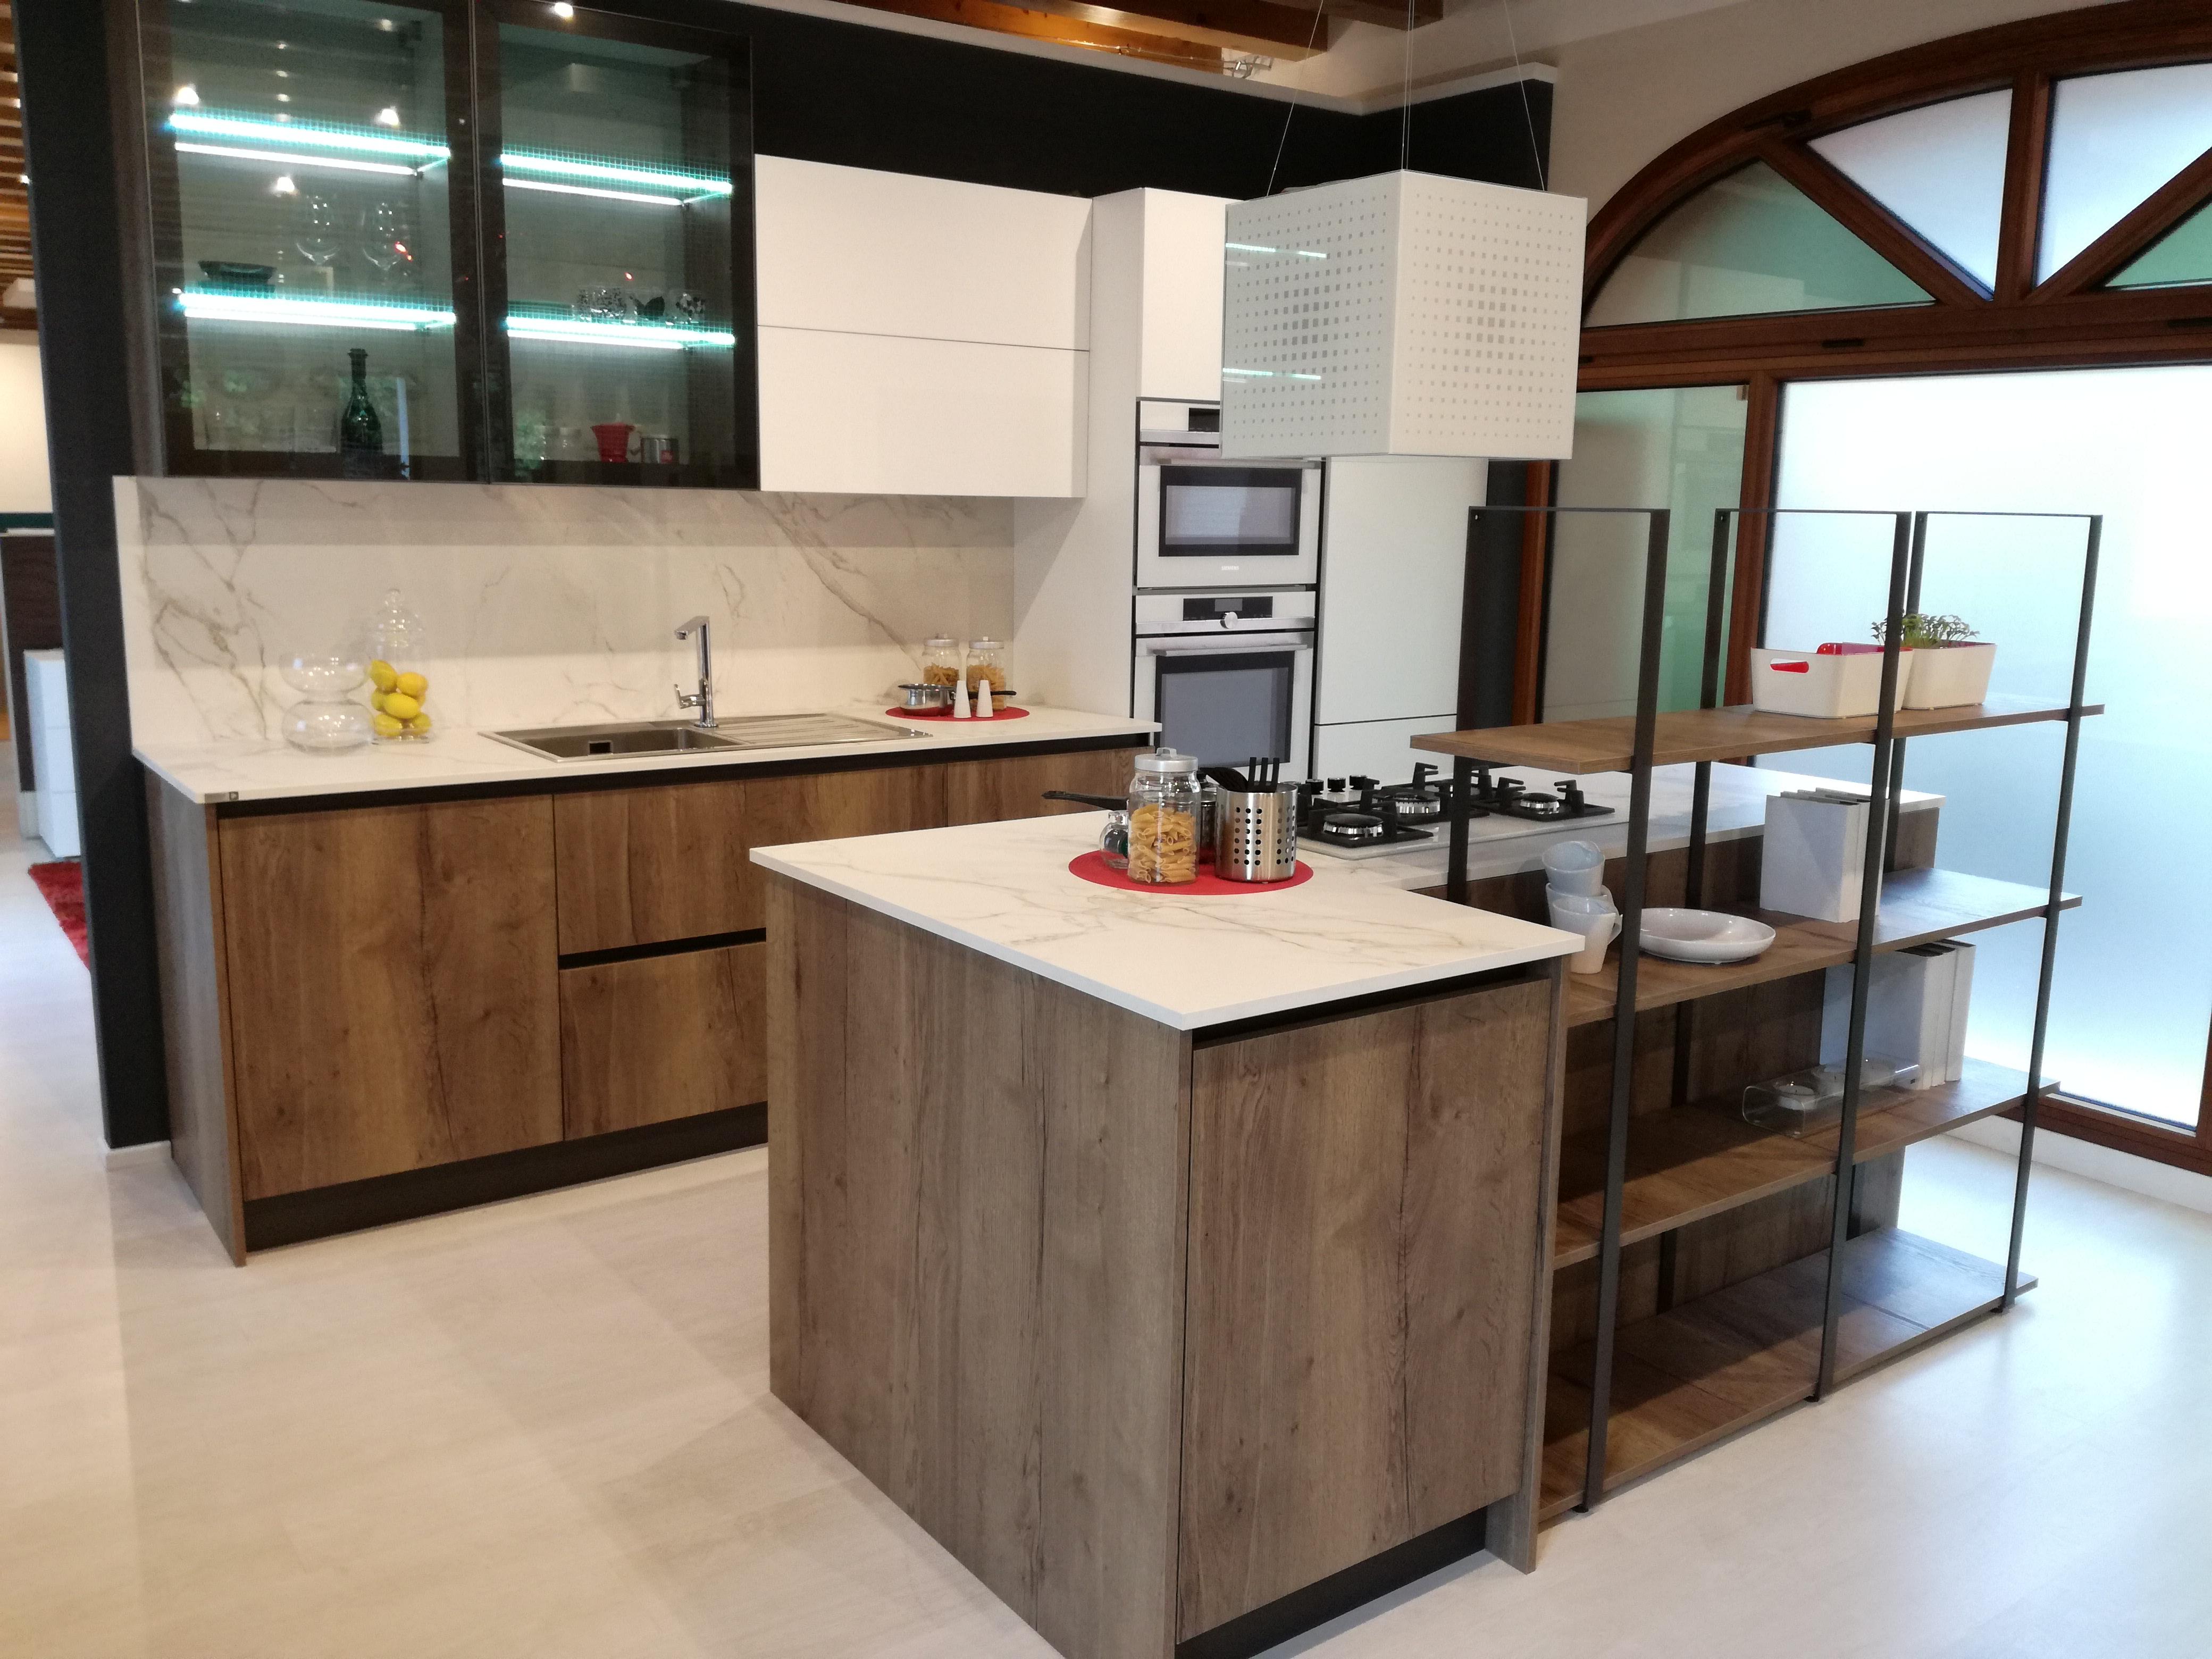 cucina dal design industriale. Modelli Iside e Atlanta di Arrex cucine